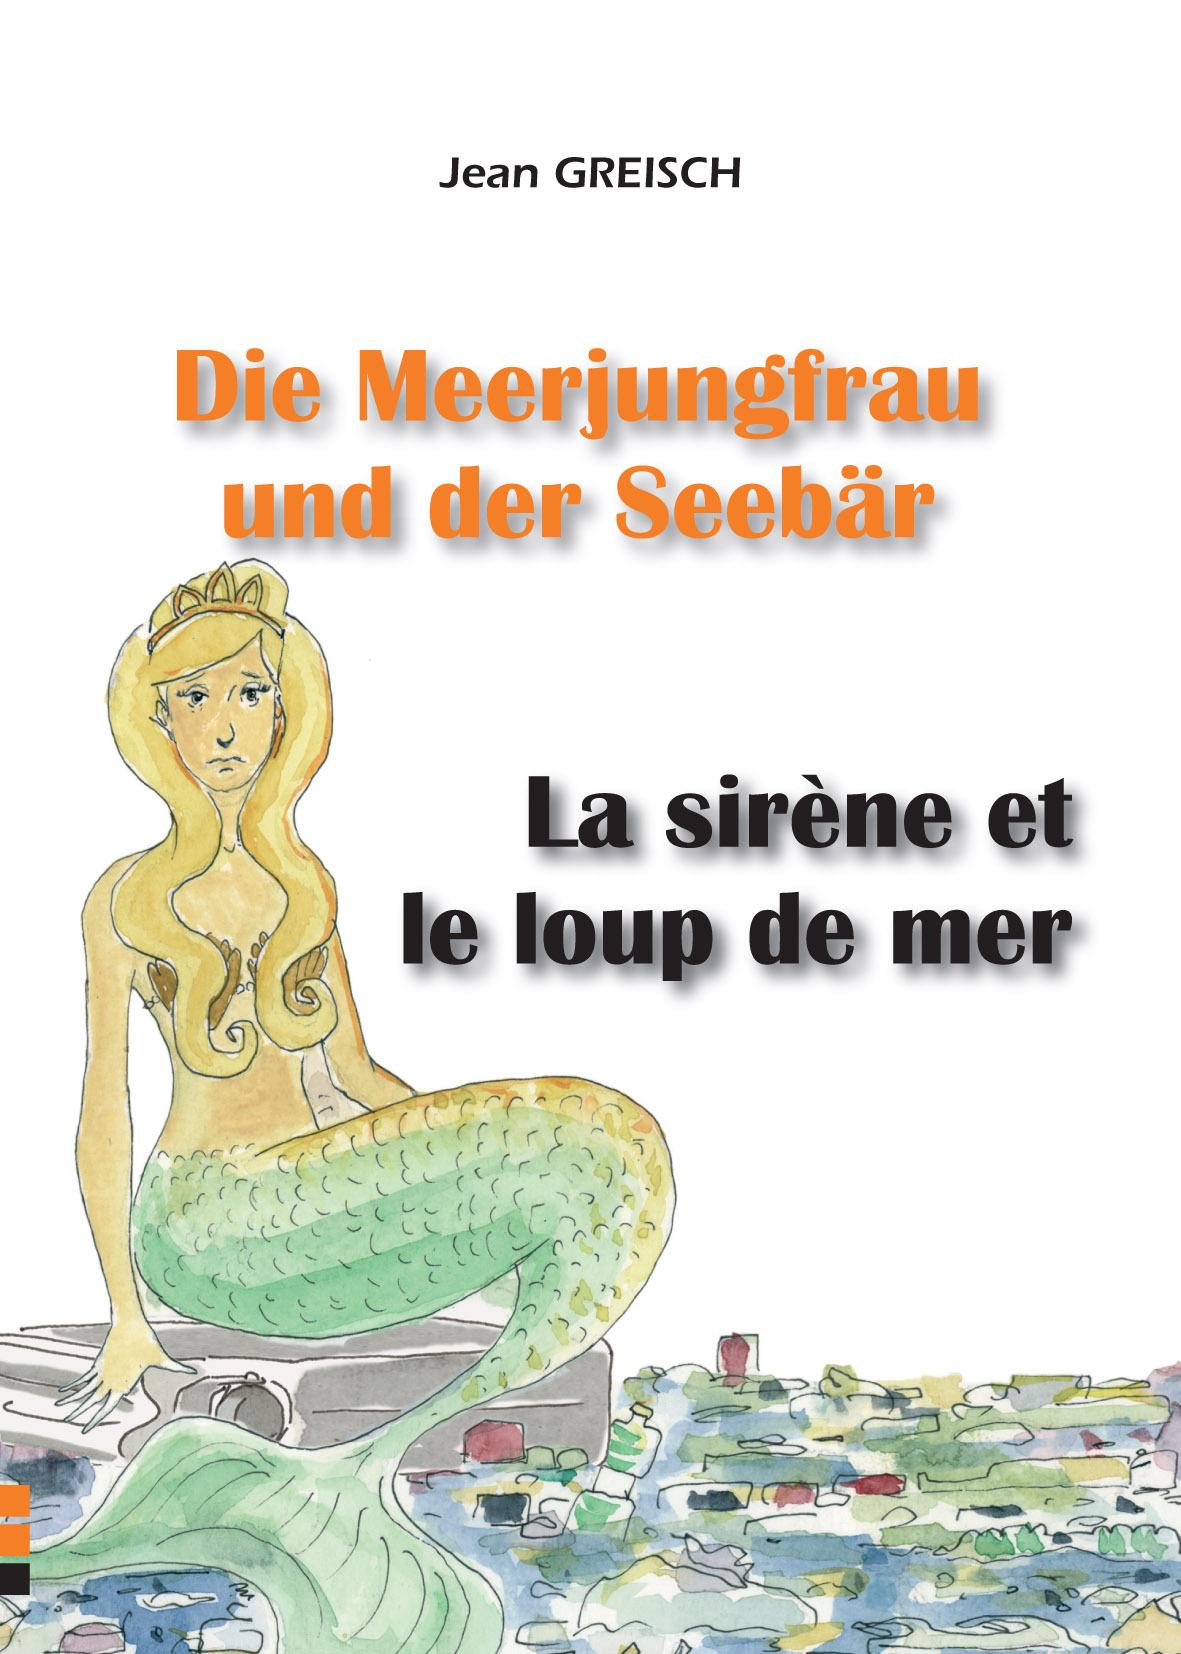 LA SIRENE ET LE LOUP DE MER / DIE MEERJUNGFRAU UND DER SEEBAR